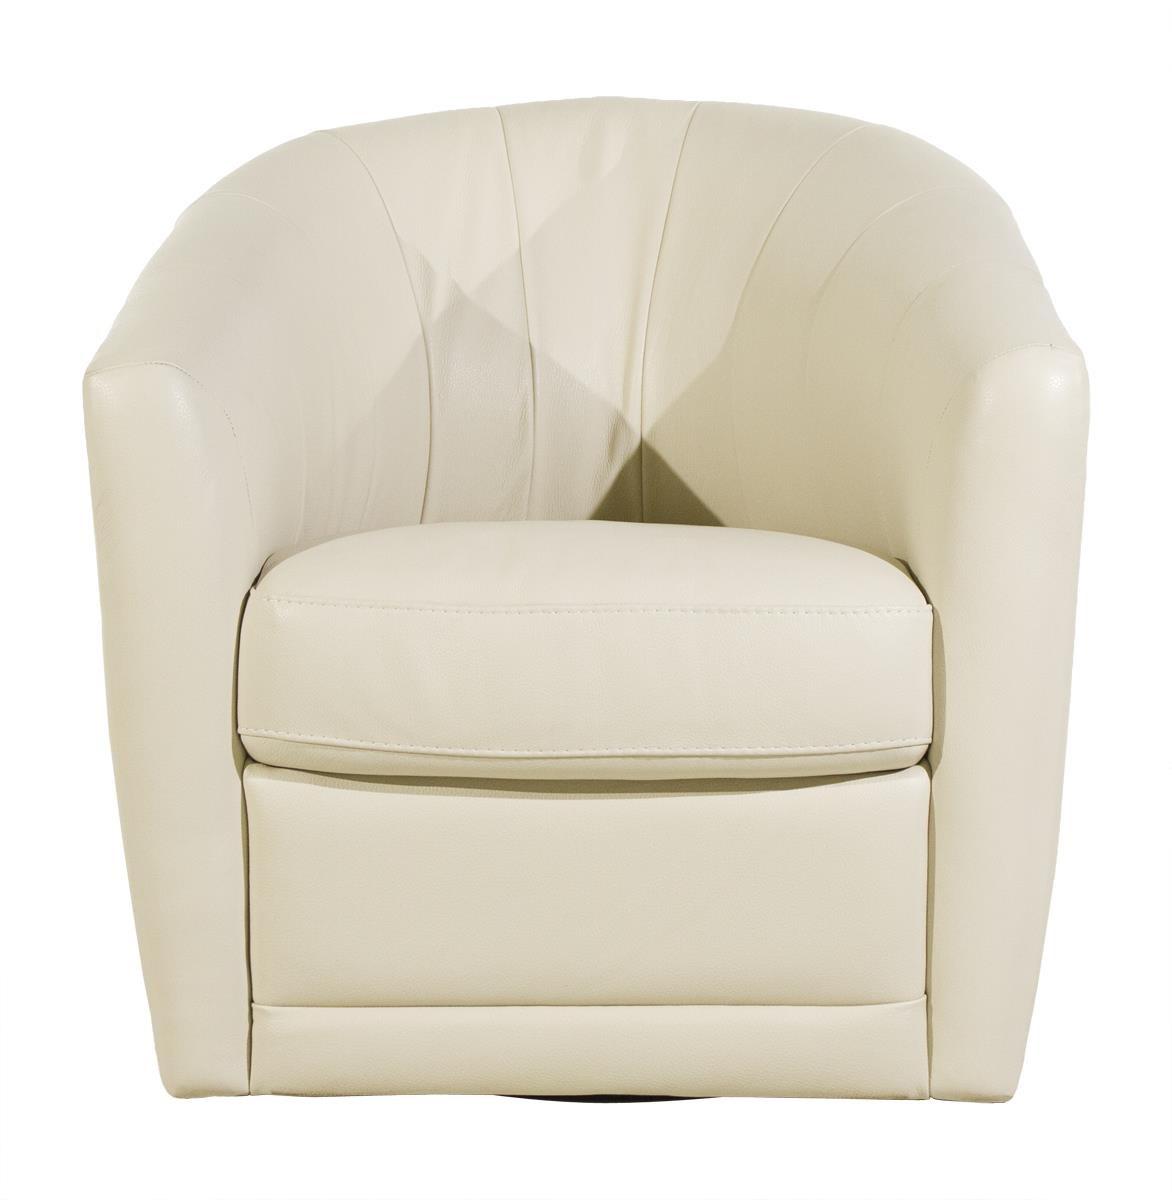 natuzzi swivel chair antique gold accent chairs editions giada homeworld furniture